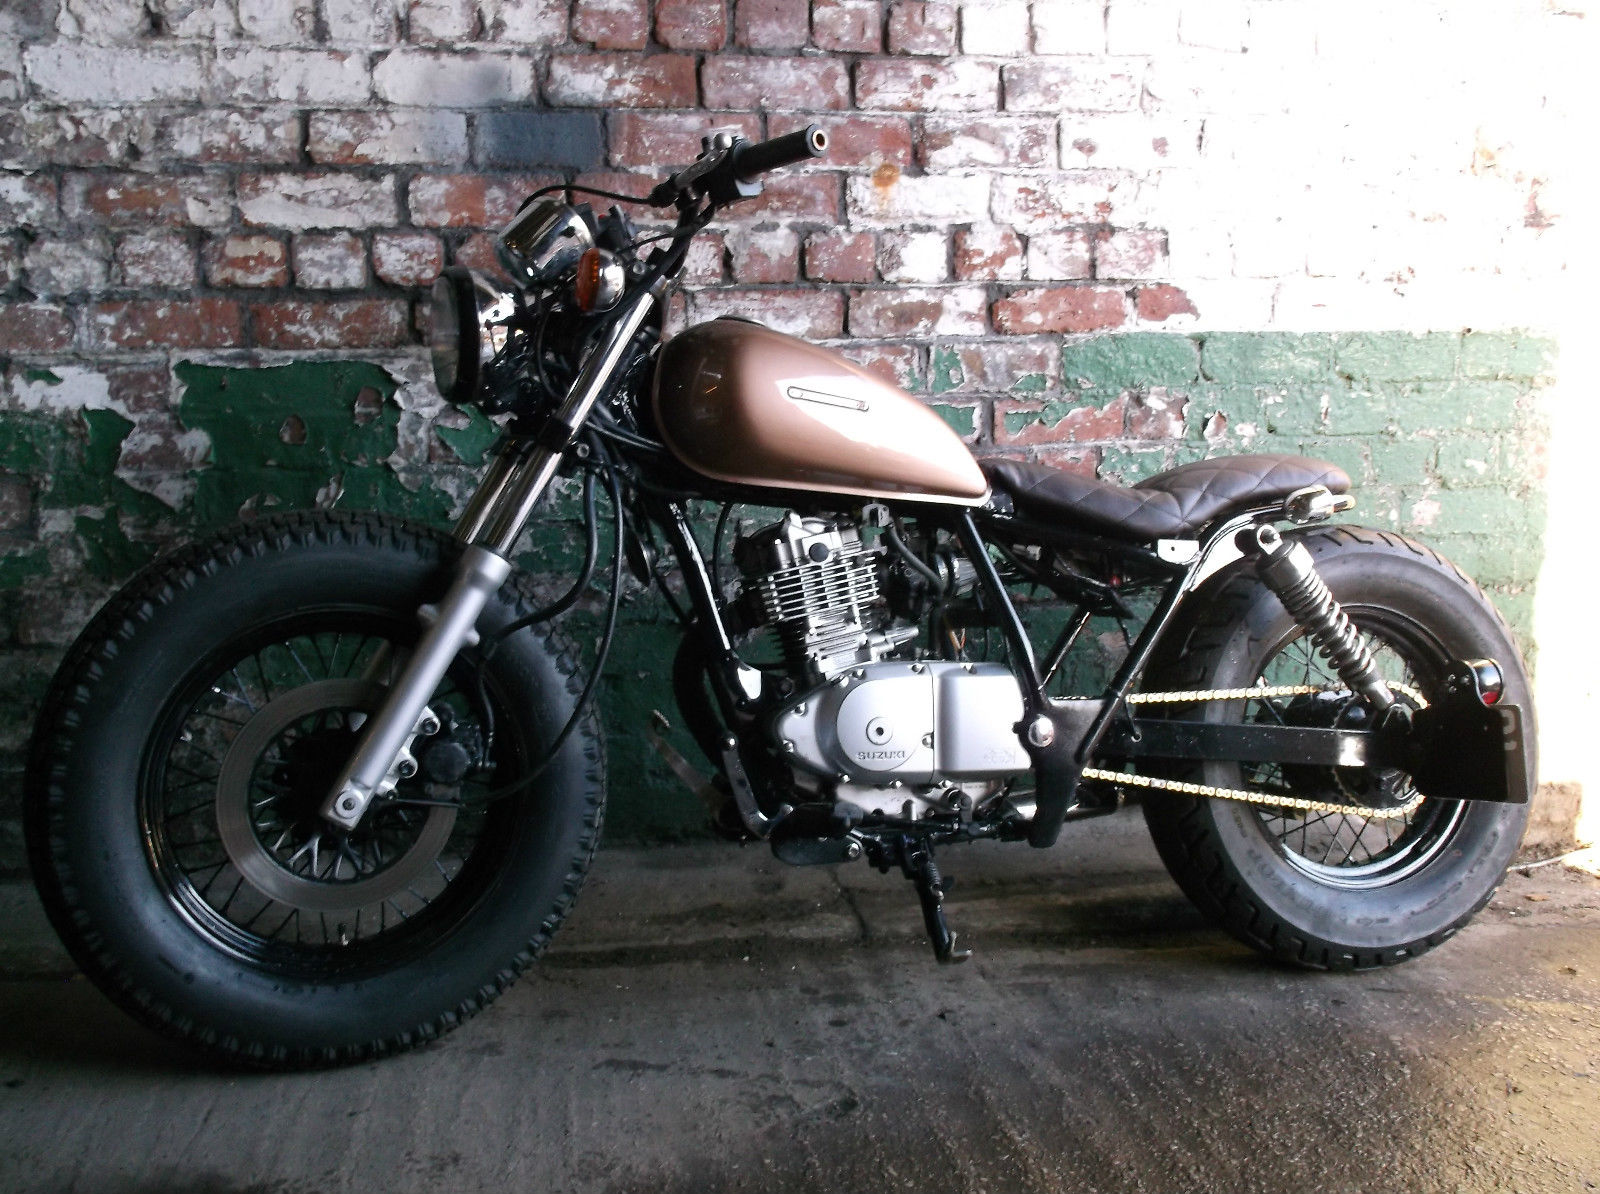 suzuki marauder gz gn 125 custom bobber tracker motorcycle. Black Bedroom Furniture Sets. Home Design Ideas